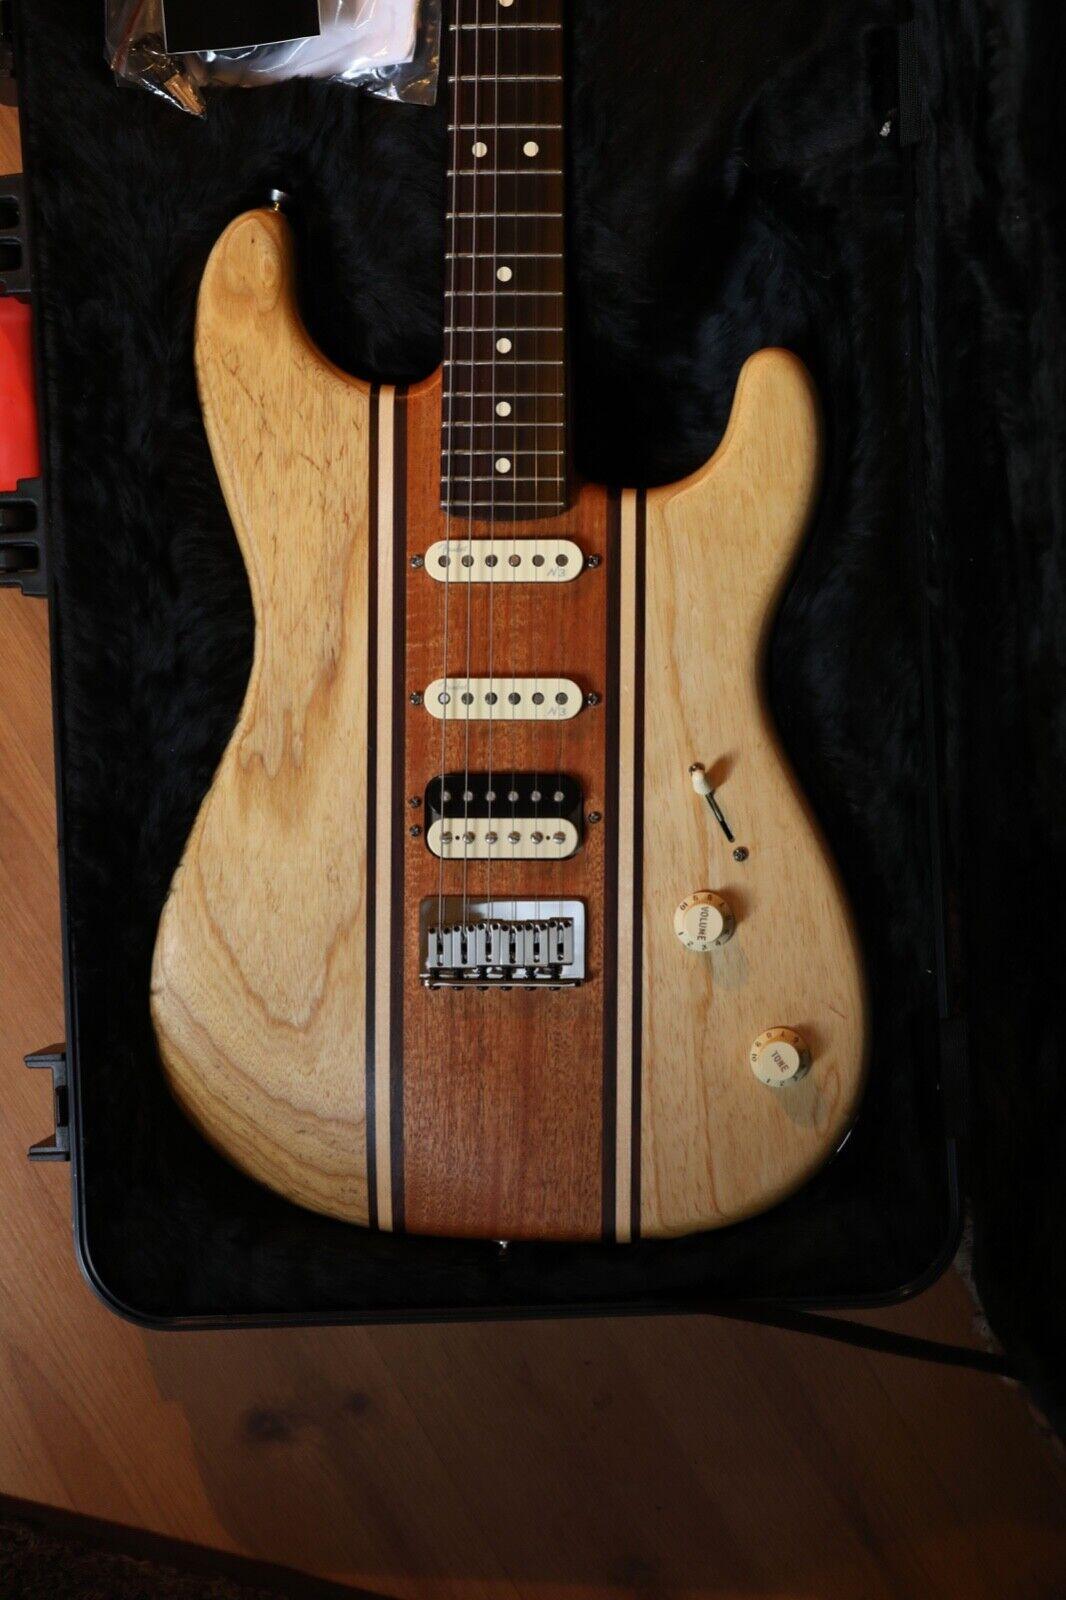 Fender American Longboard Stratocaster HSS Guitar - $1,975.00